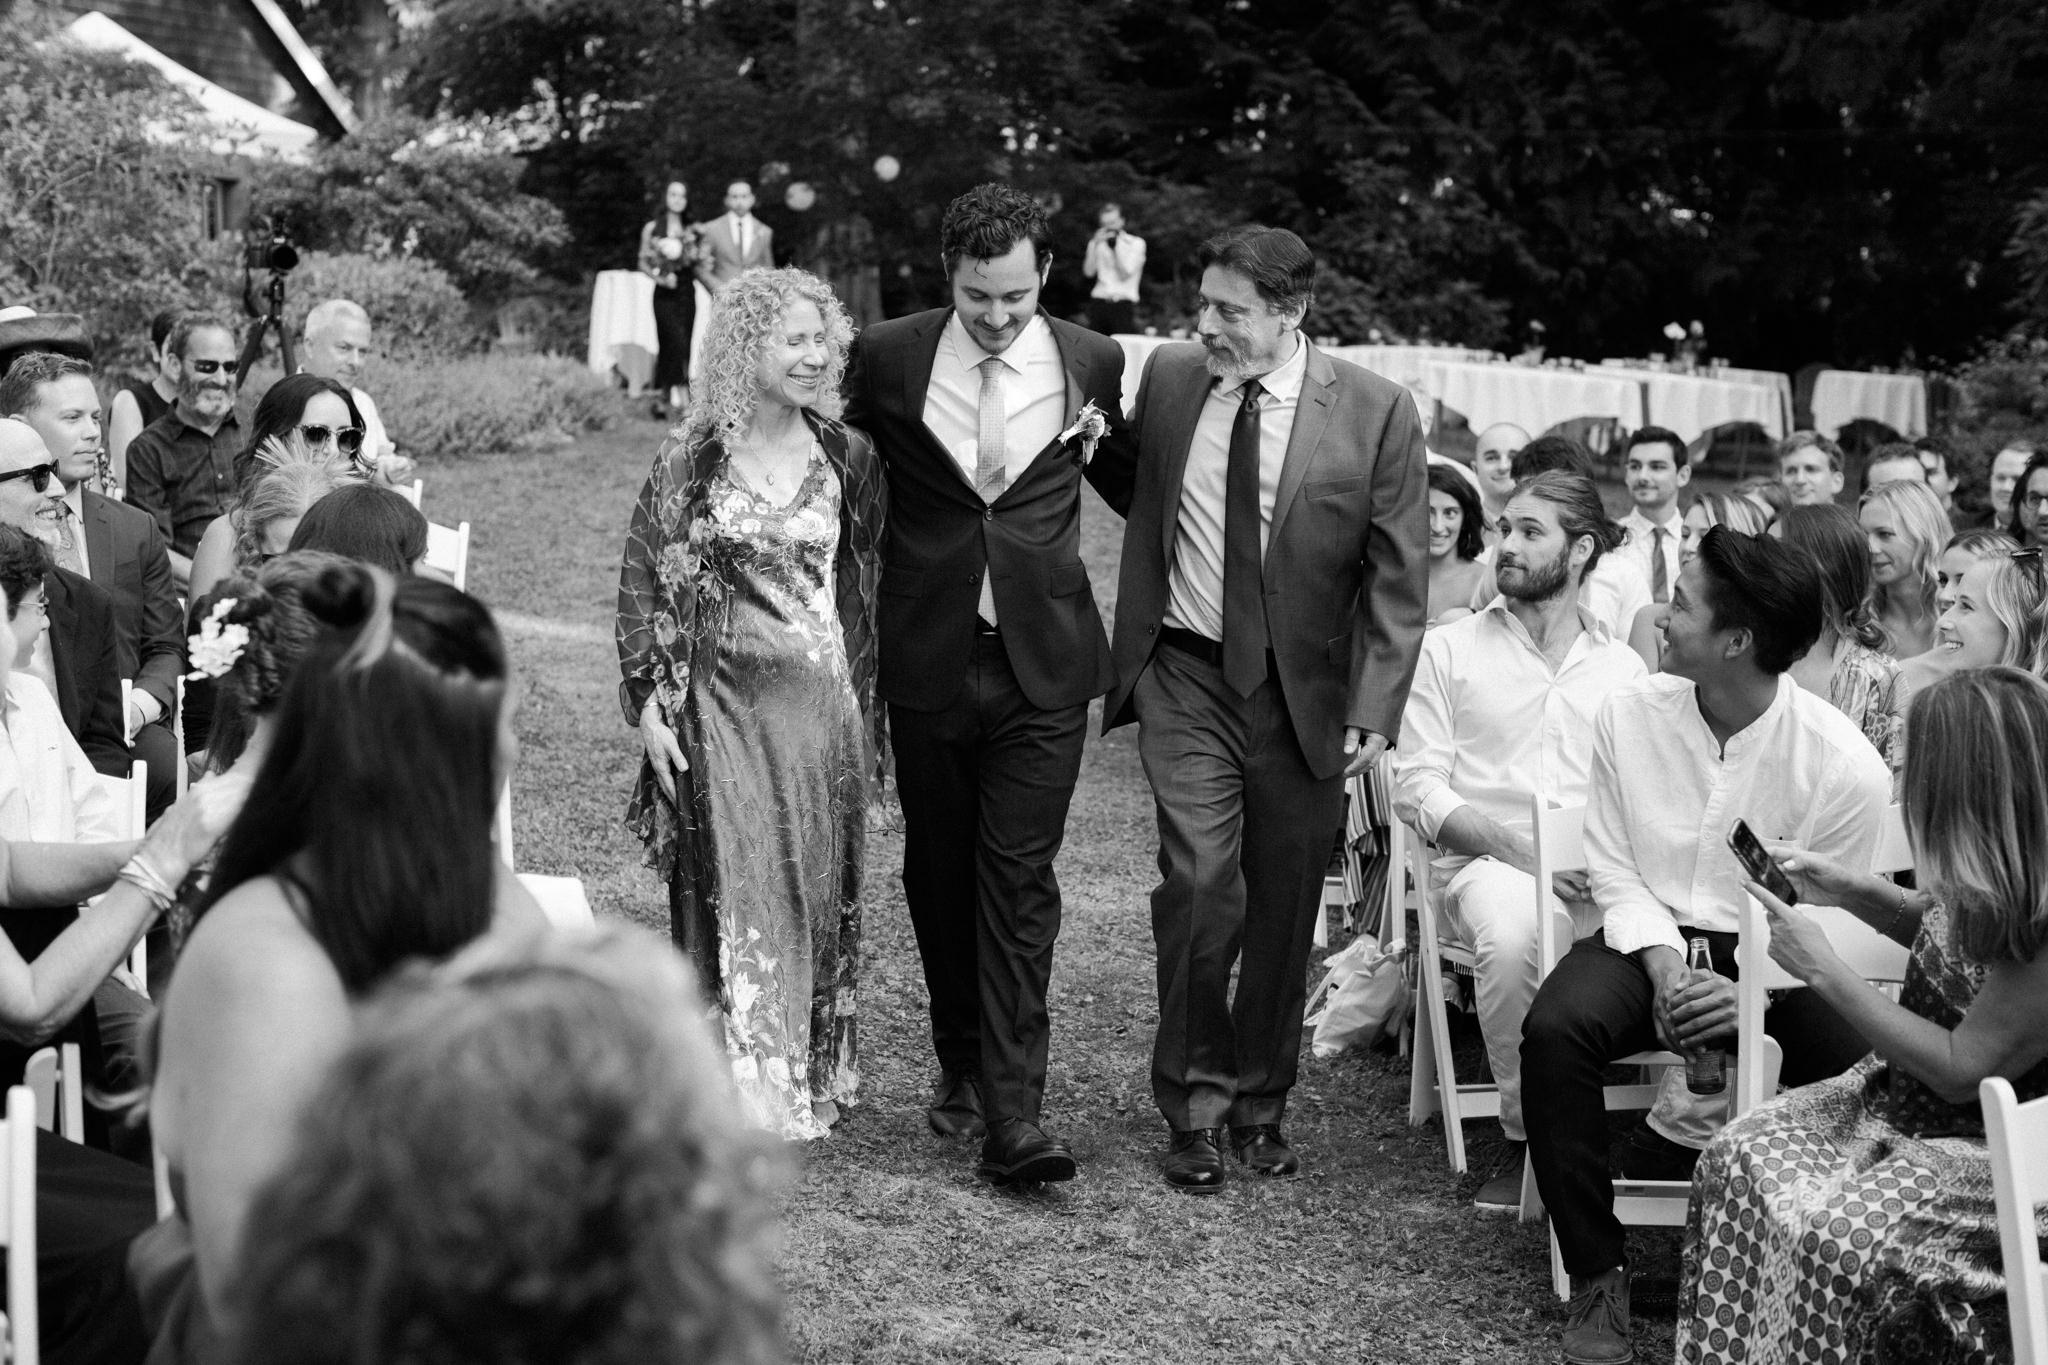 Backyard-Bainbridge-Island-Wedding-Alycia-Lovell-Photography-83.JPG